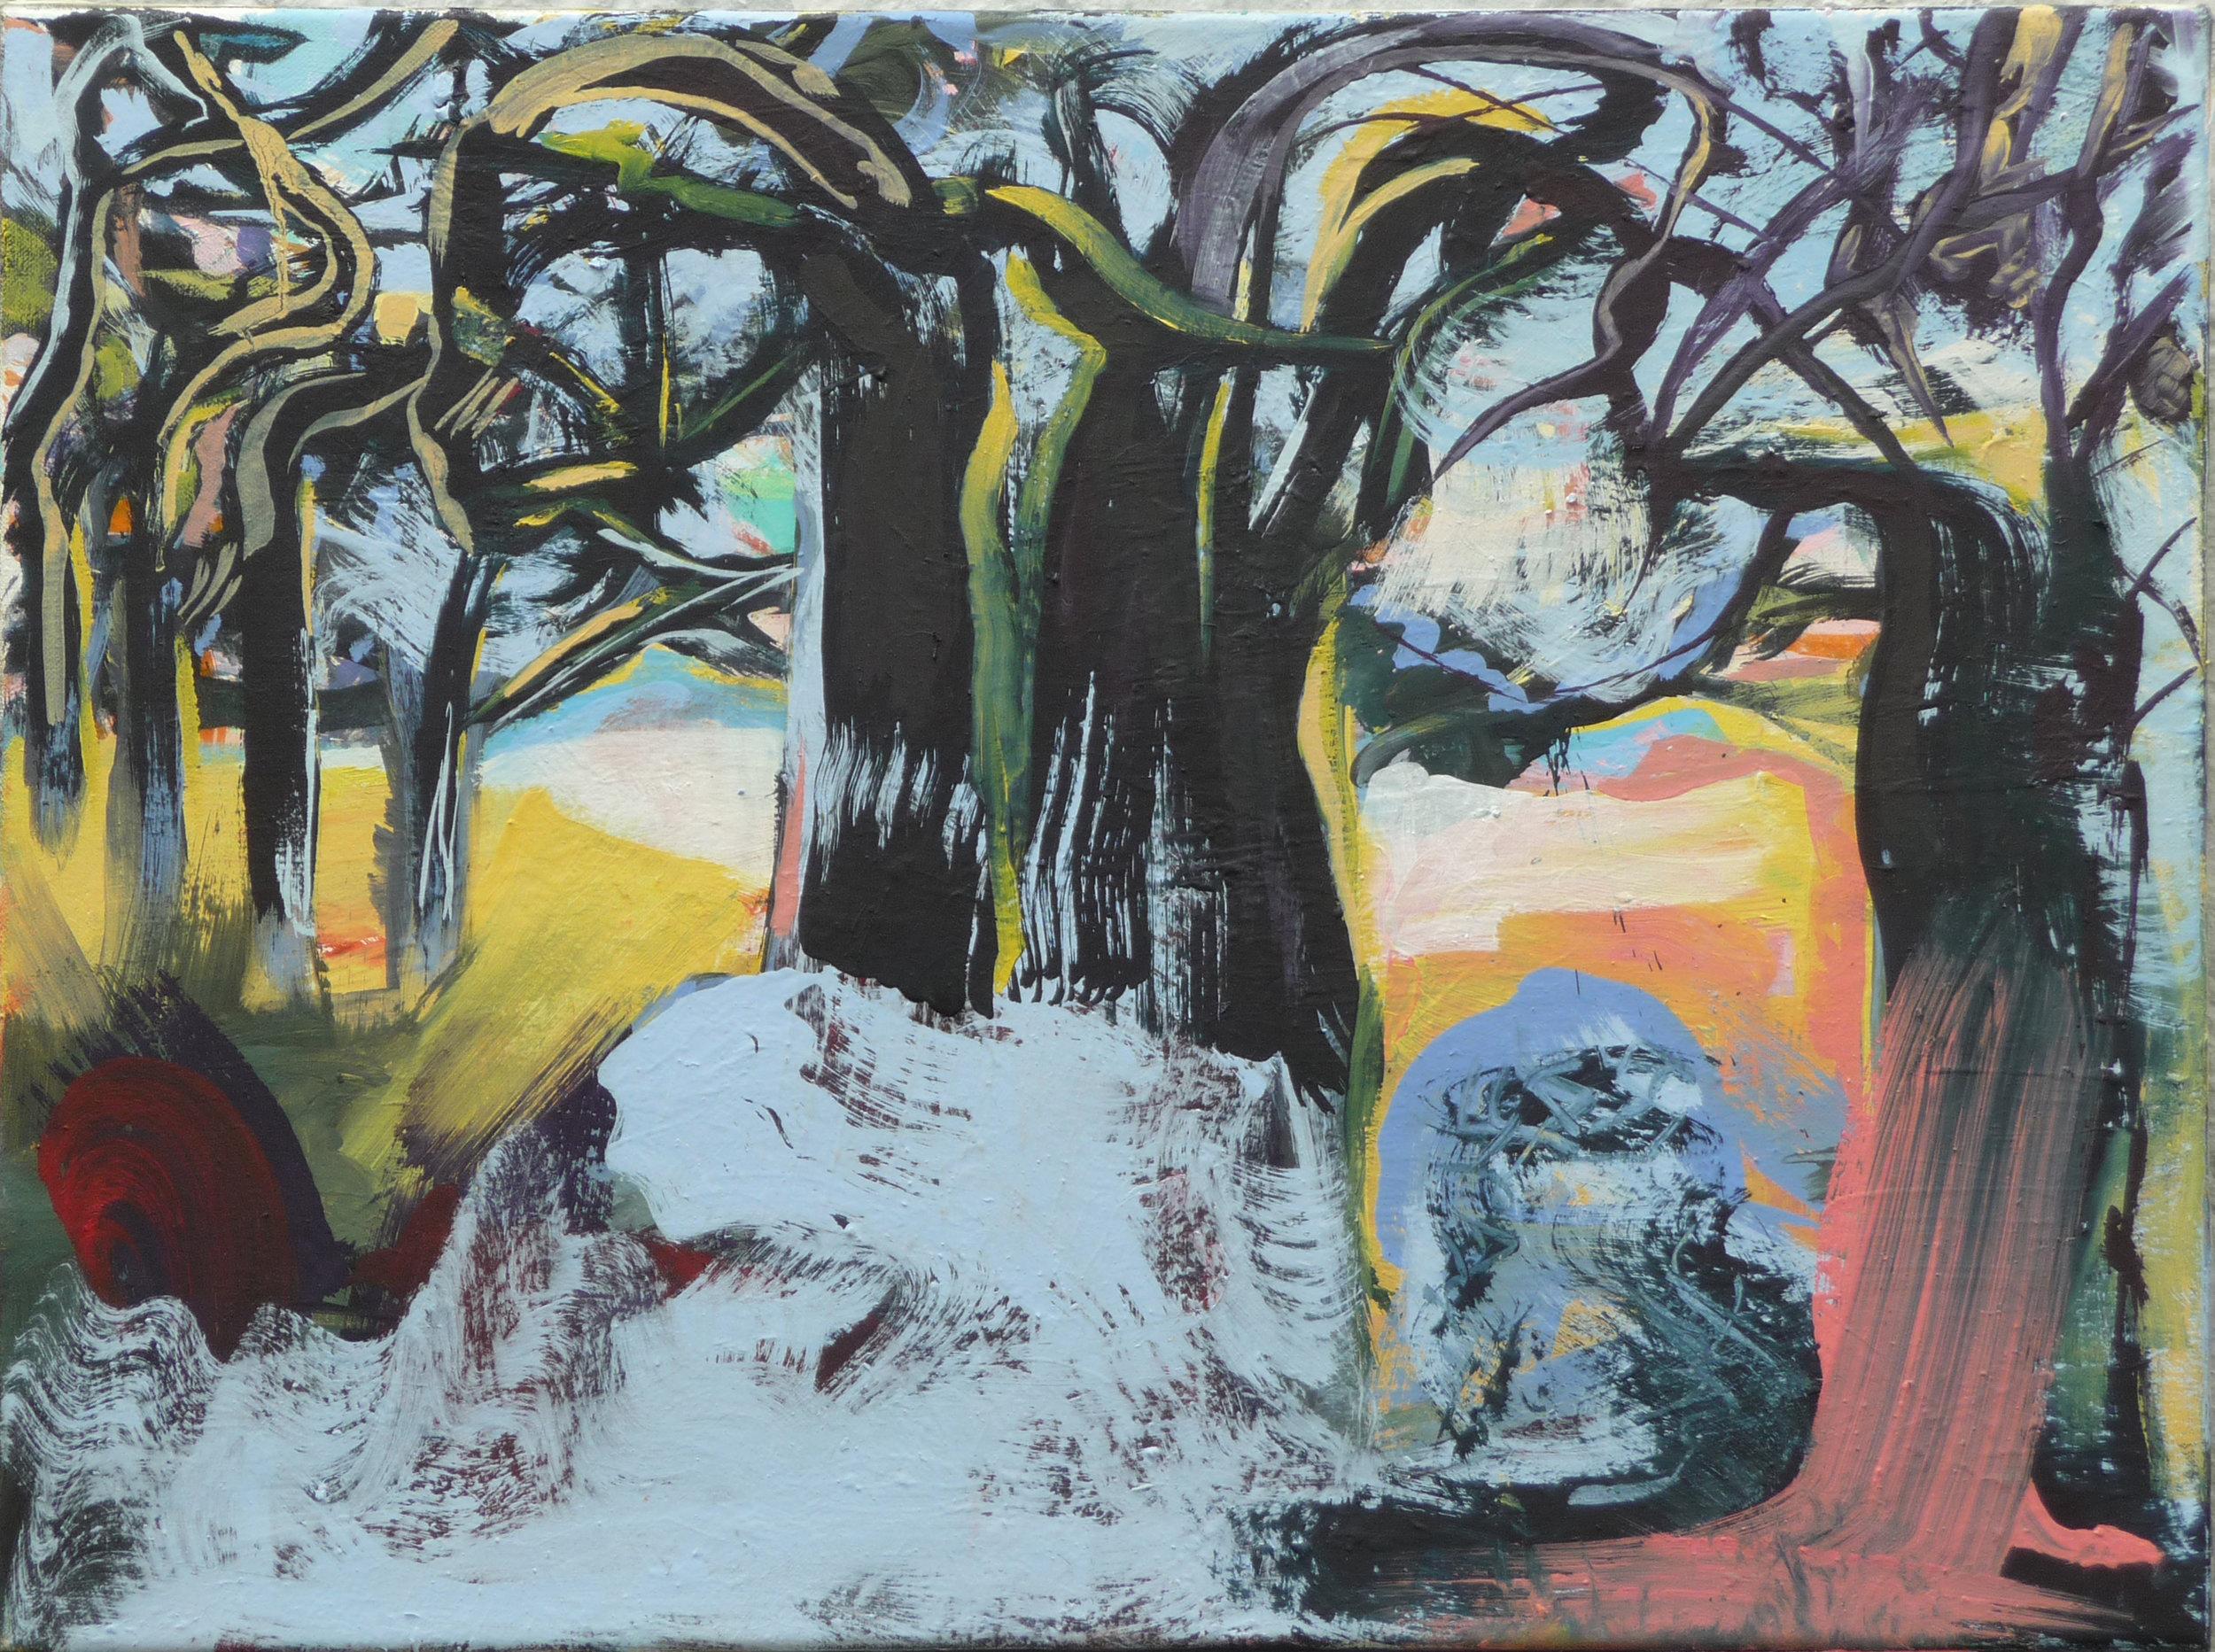 Image iV, oil on canvas, 70 x 90 cm